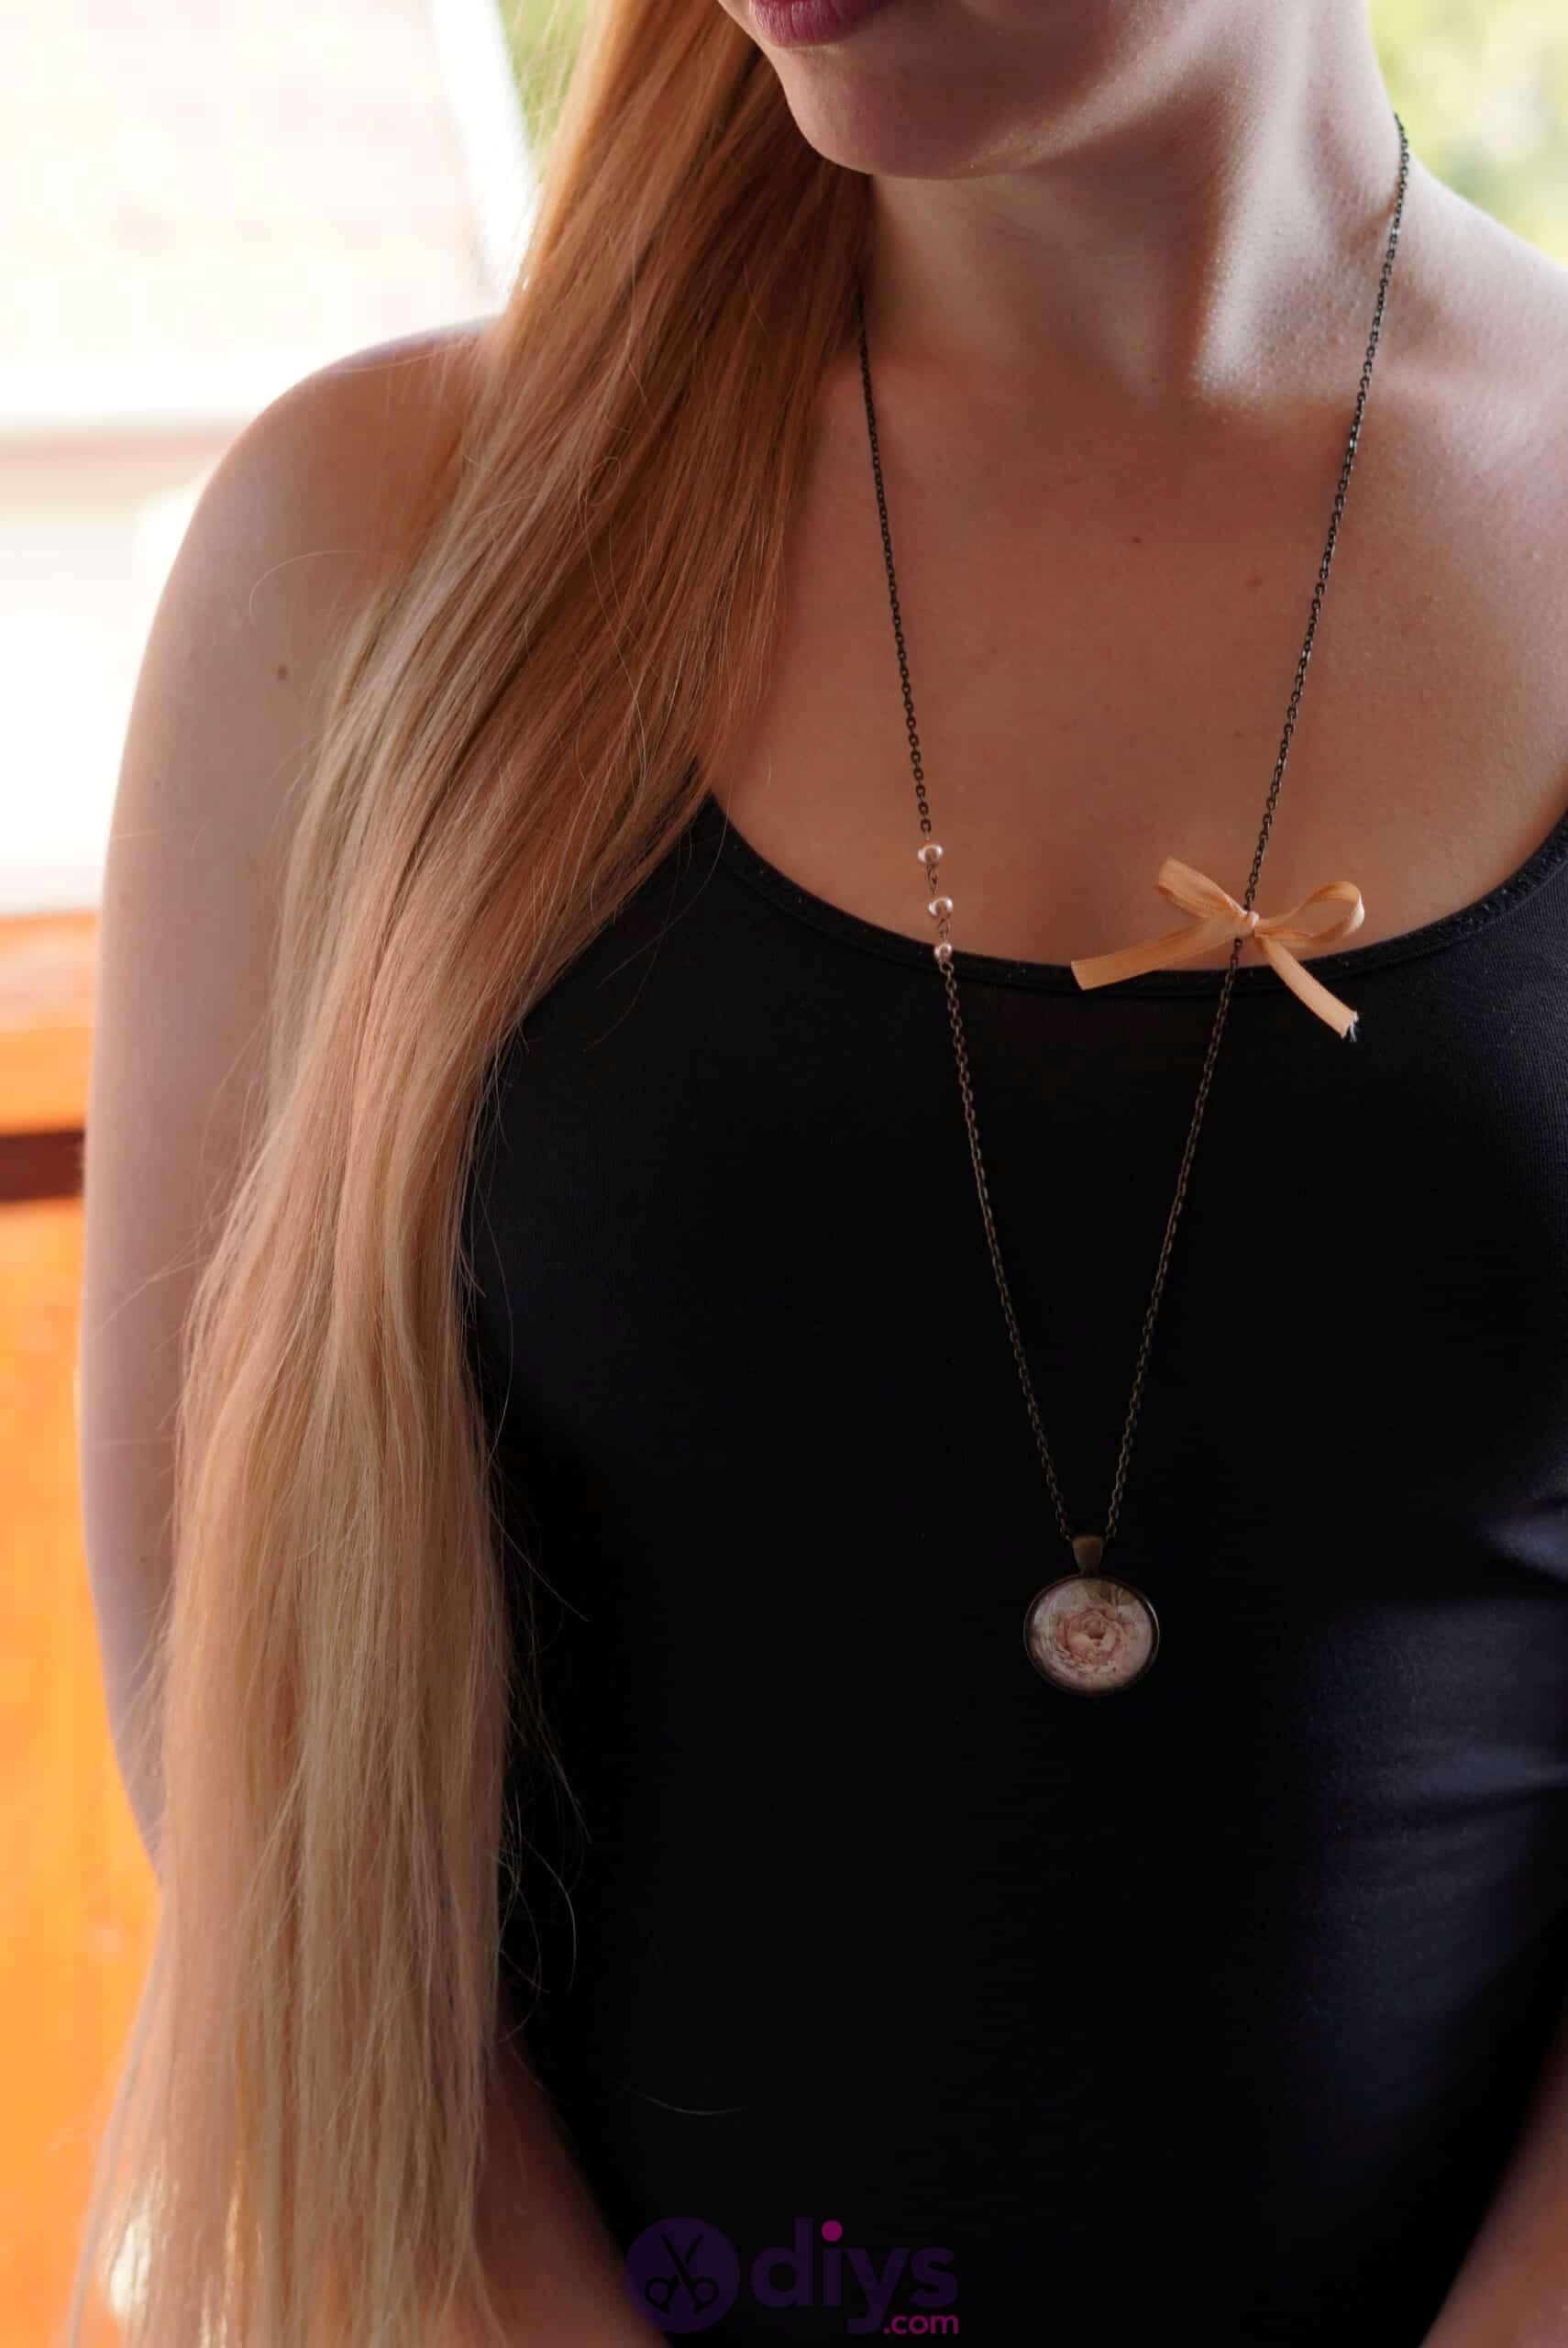 Glass lens necklace